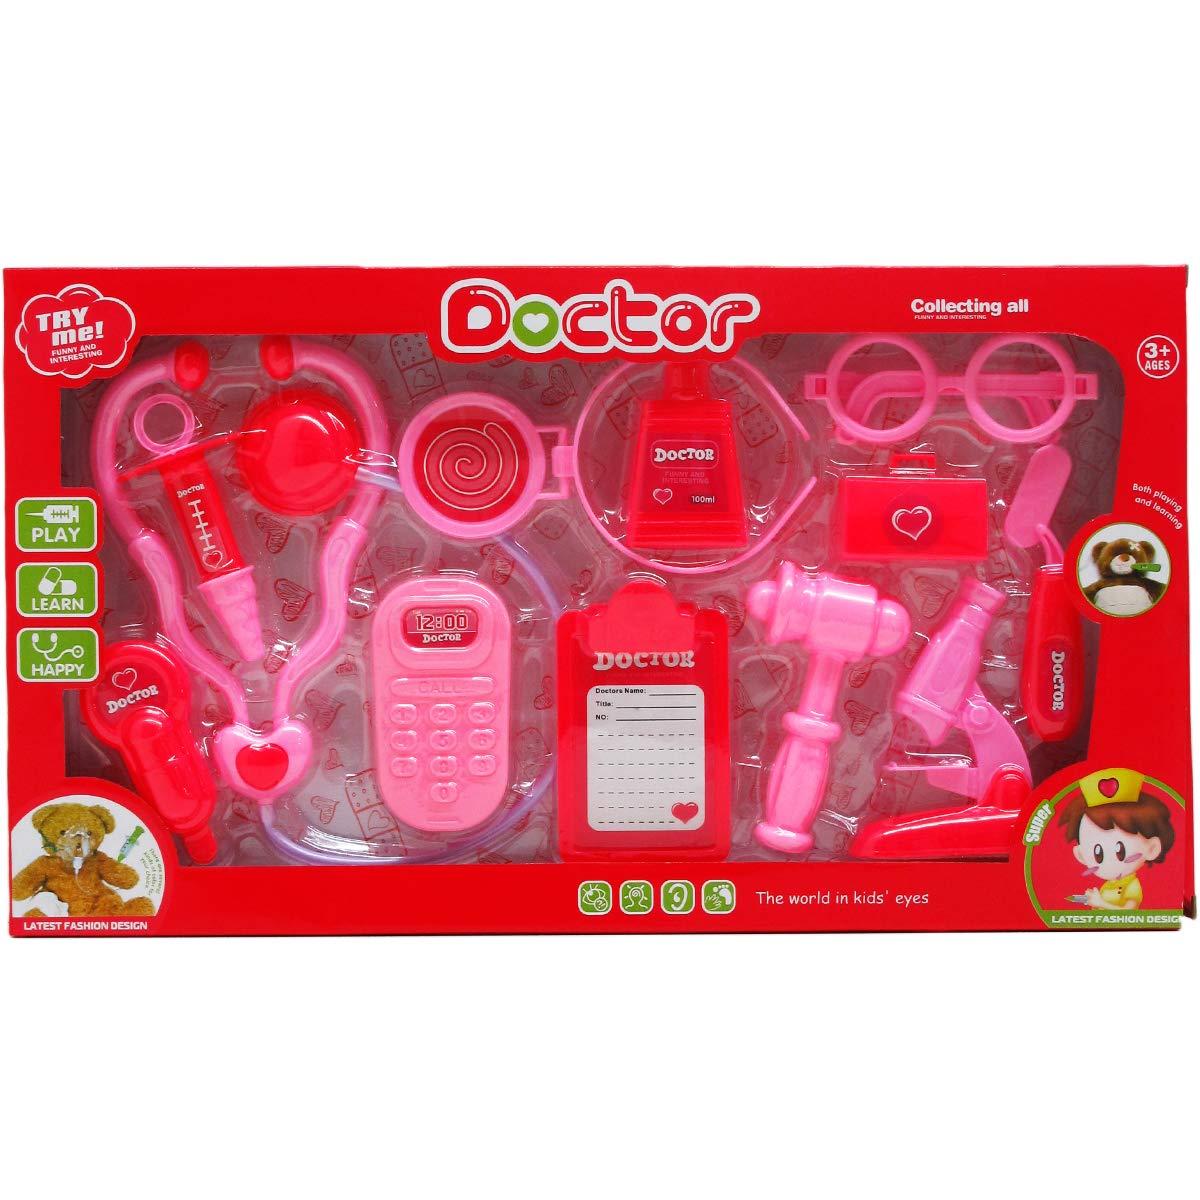 DDI 2322392 12 Piece Girls Doctor Play Set - Case of 24